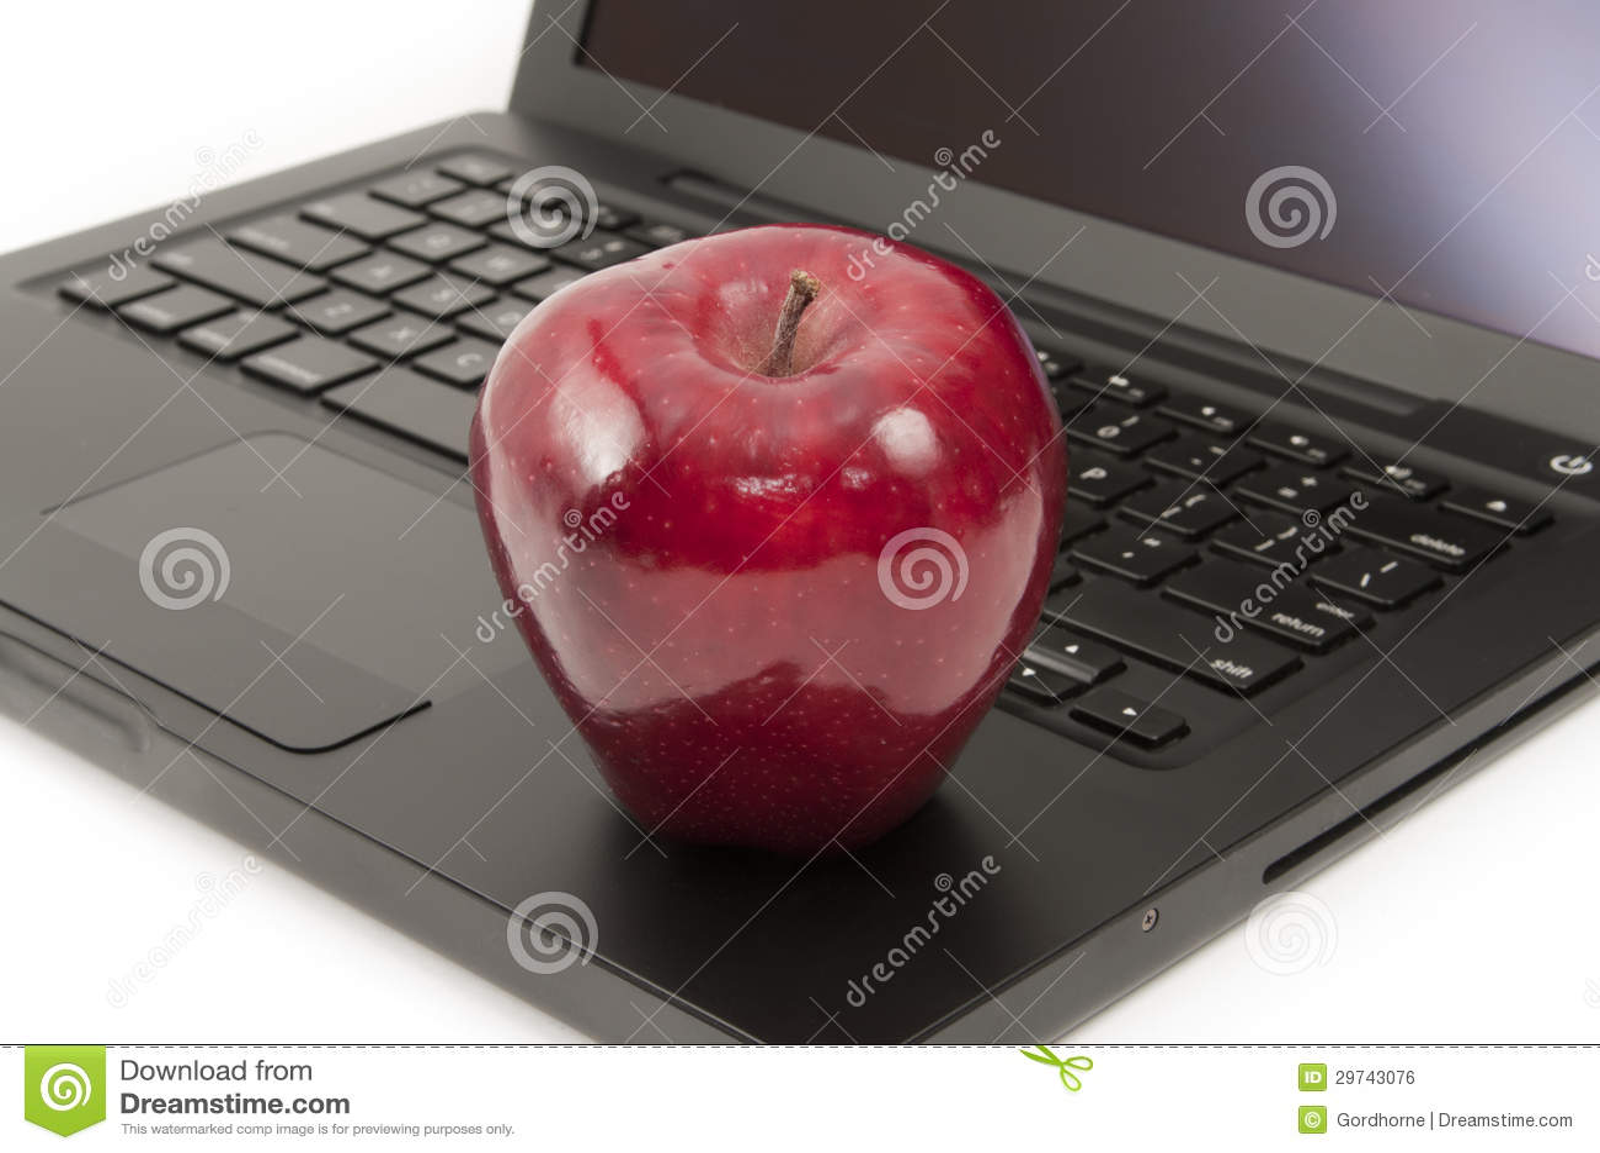 Macintosh Laptop Prices